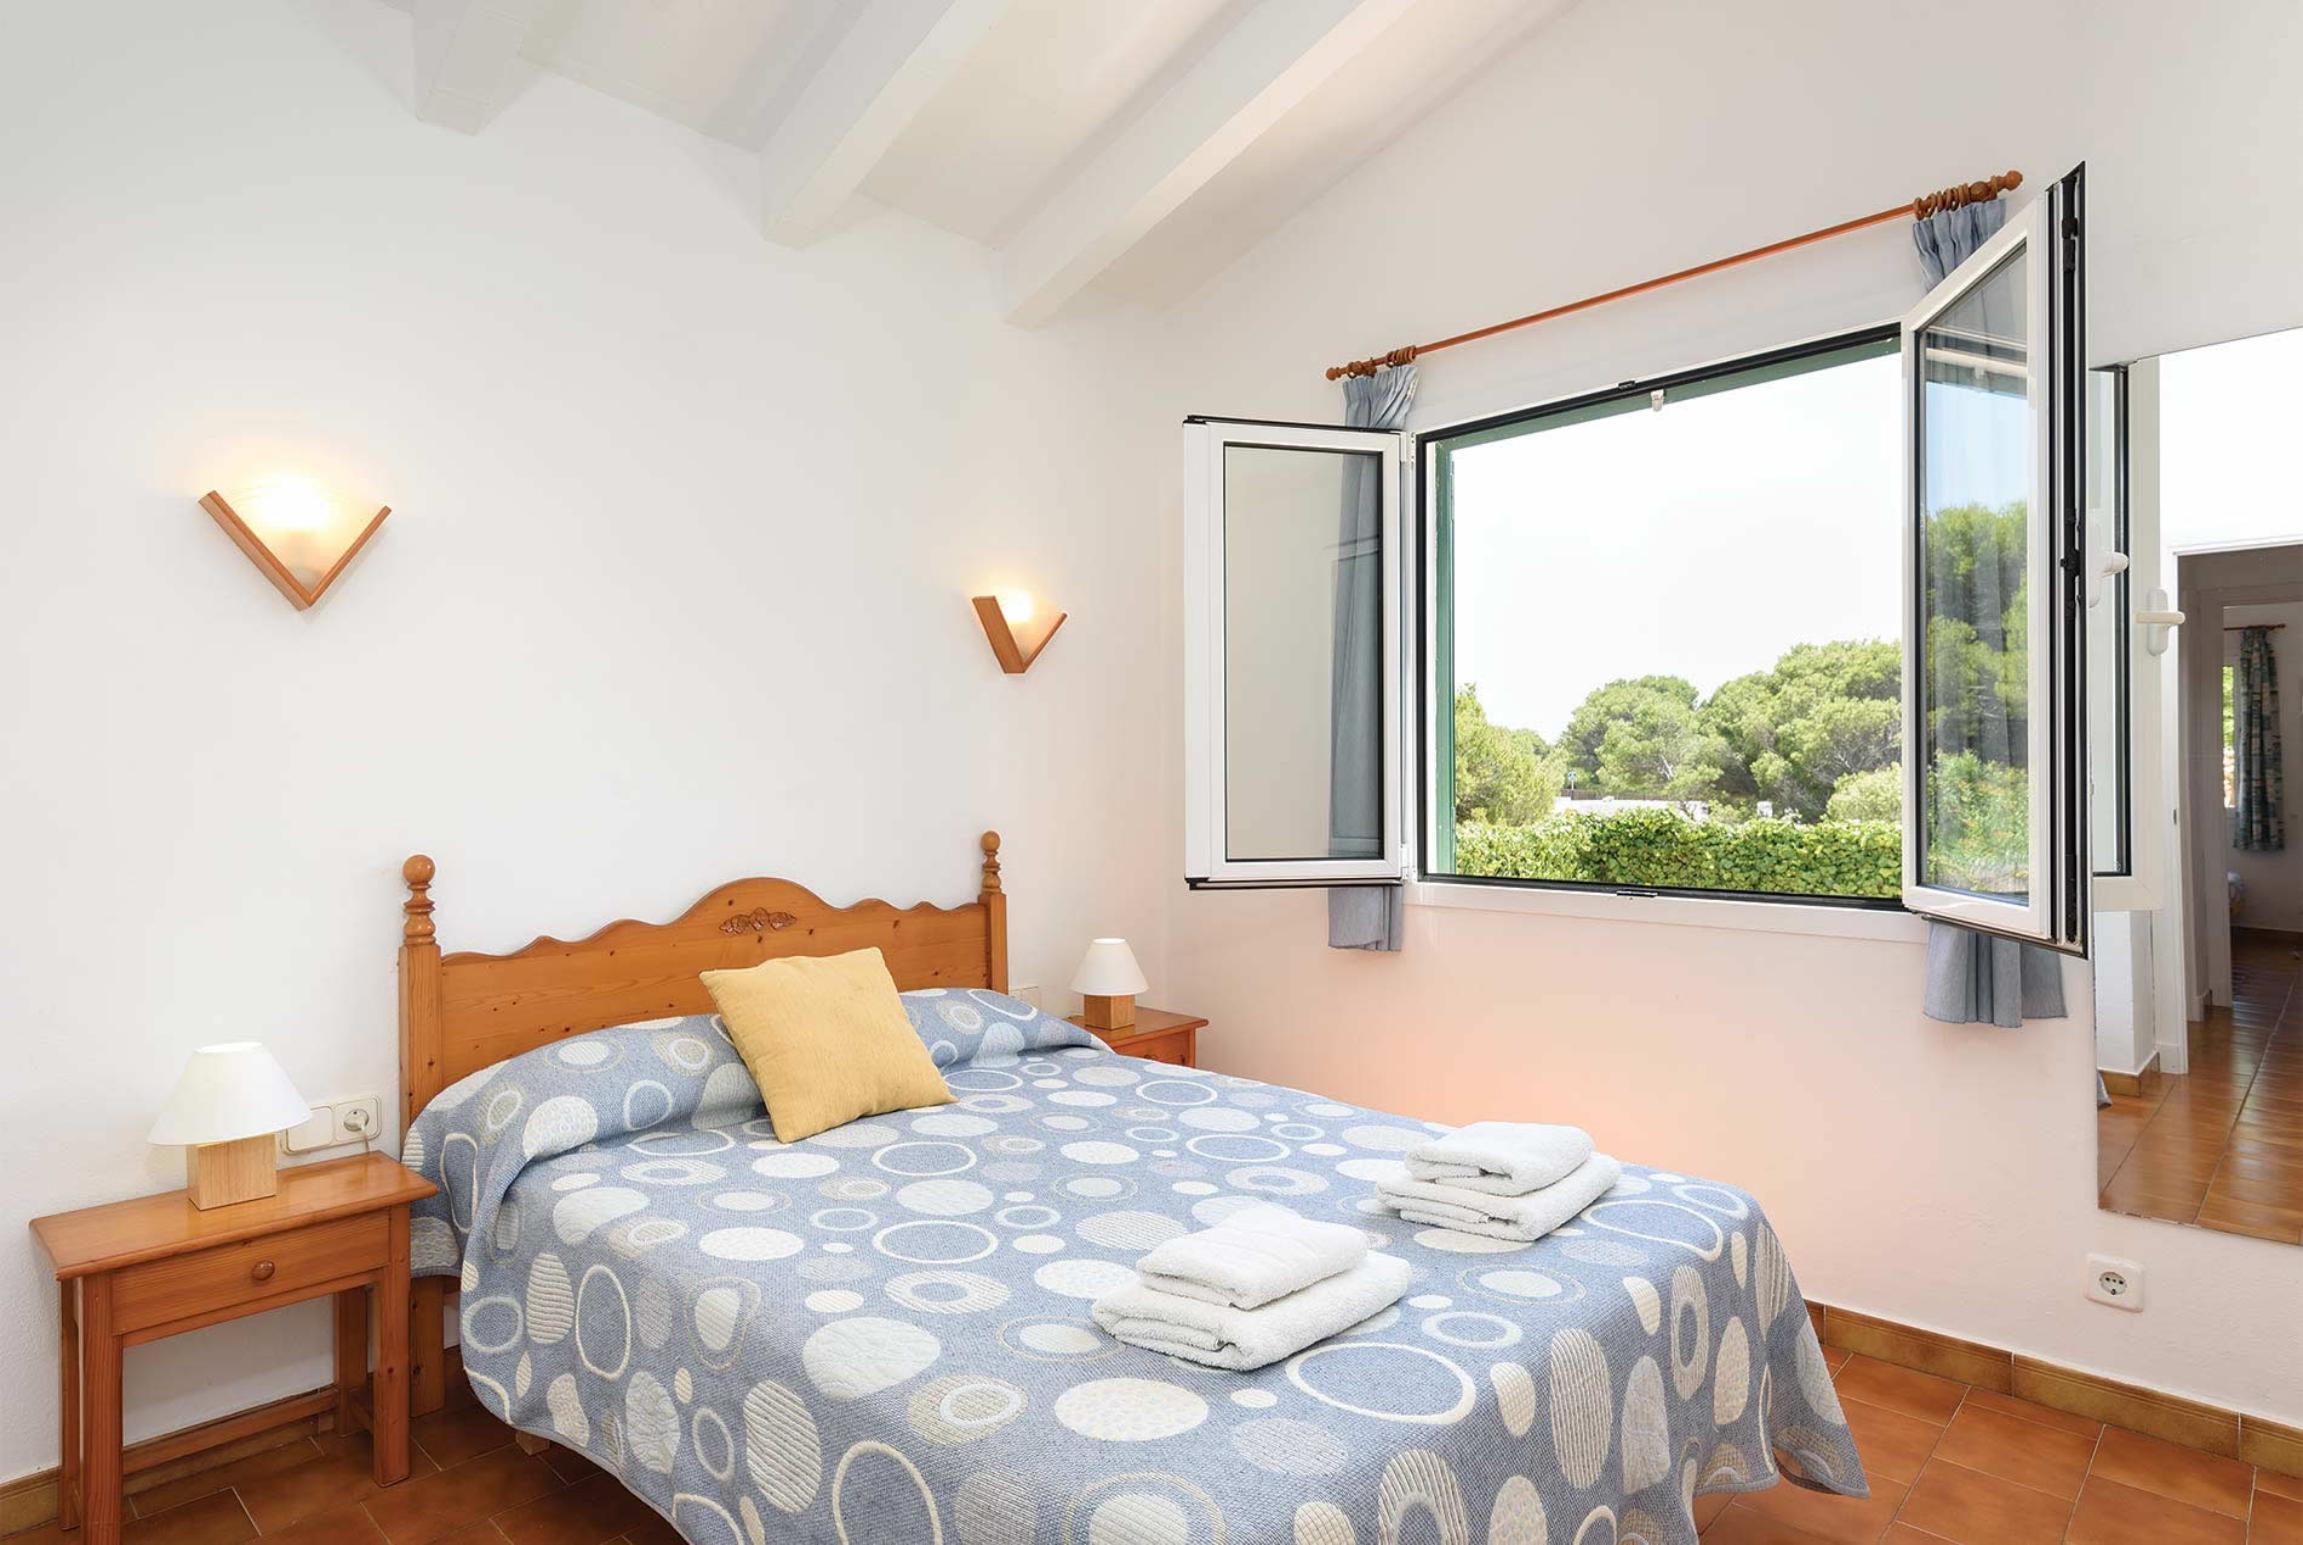 Ferienhaus Eulalia I (2653535), Arenal De'N Castell, Menorca, Balearische Inseln, Spanien, Bild 5